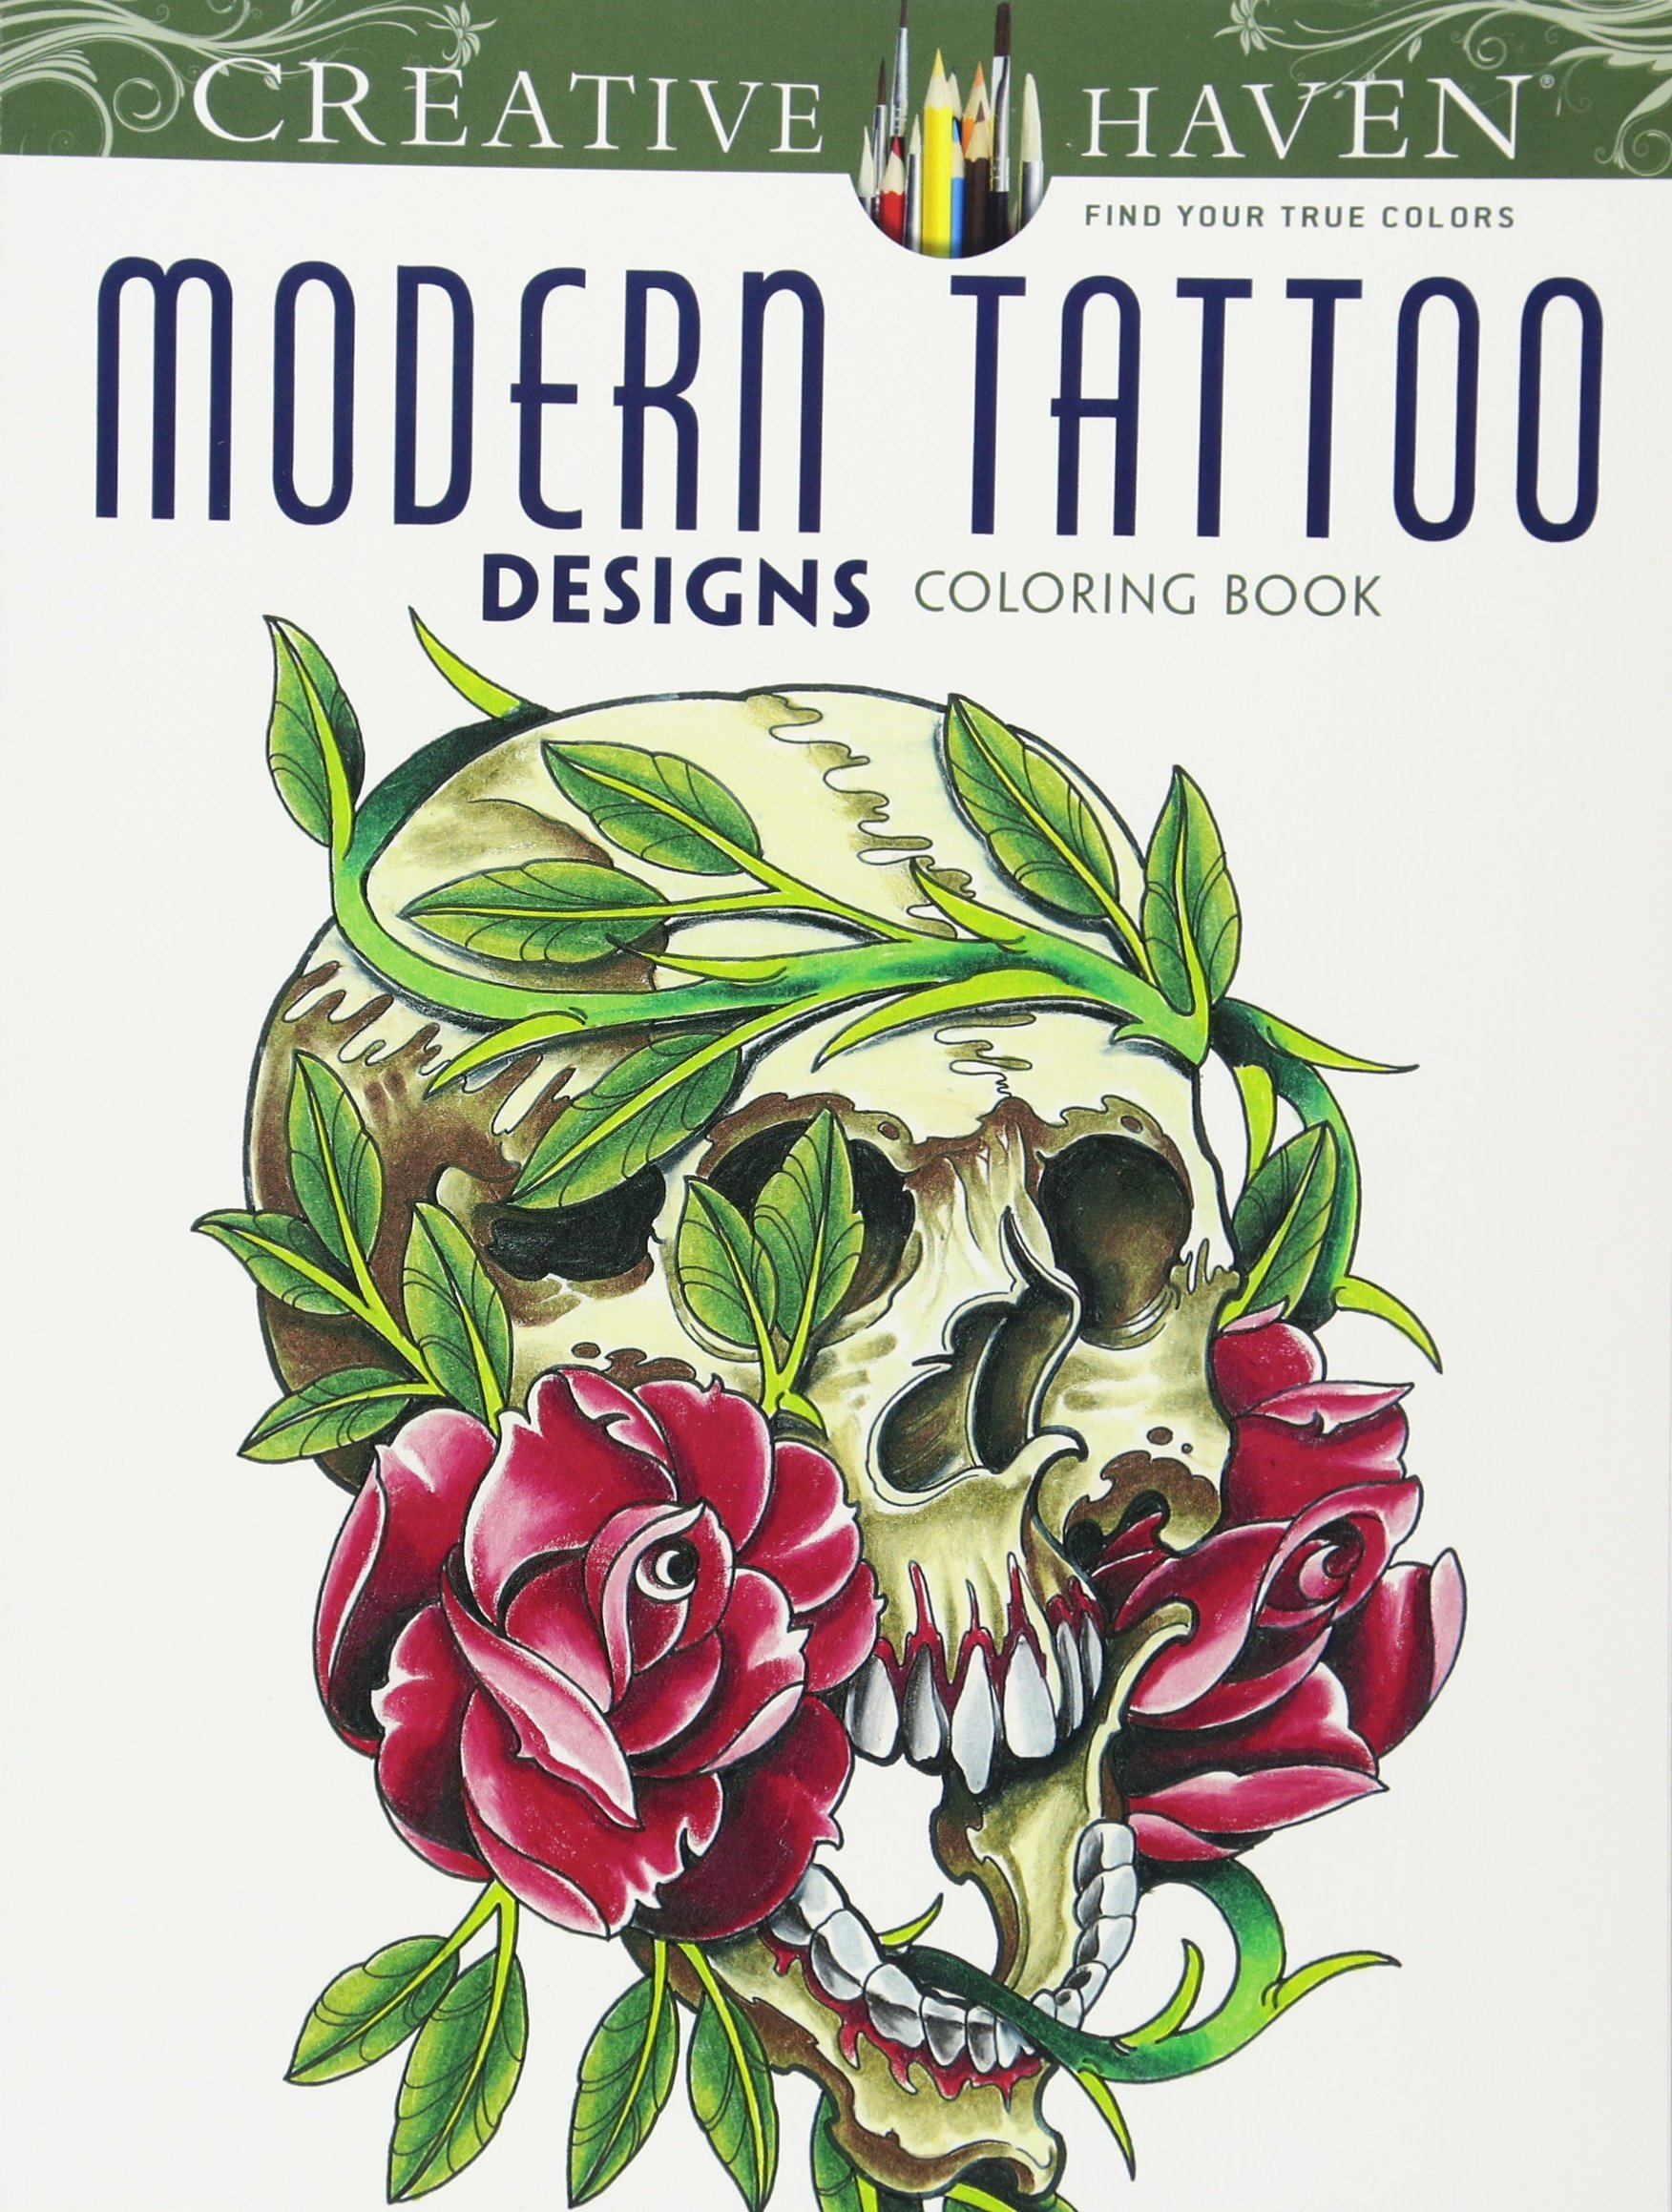 Tattoo designs coloring book - Creative Haven Modern Tattoo Designs Coloring Book Creative Haven Coloring Books Erik Siuda Creative Haven 9780486493268 Amazon Com Books